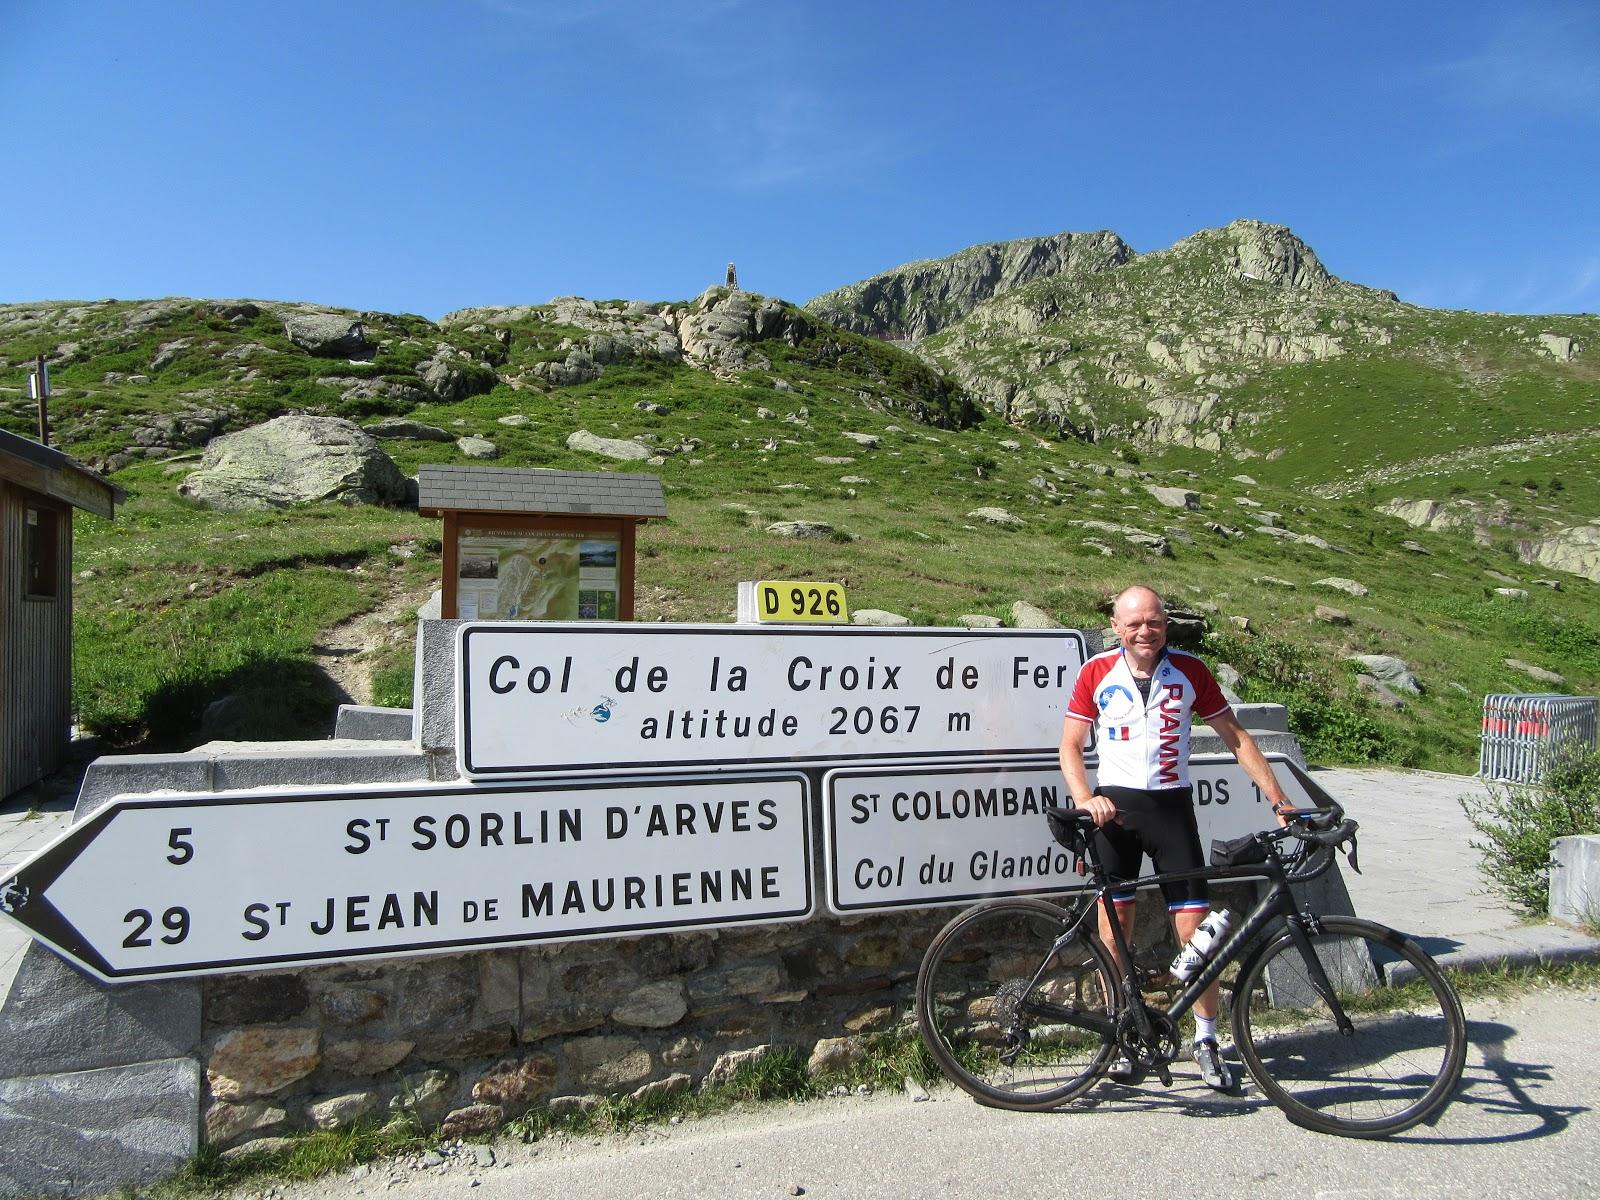 Biking Col de la Croix de Fer, Saint-Jean-de-Maurienne - John Johnson, PJAMM cycling at summit sign